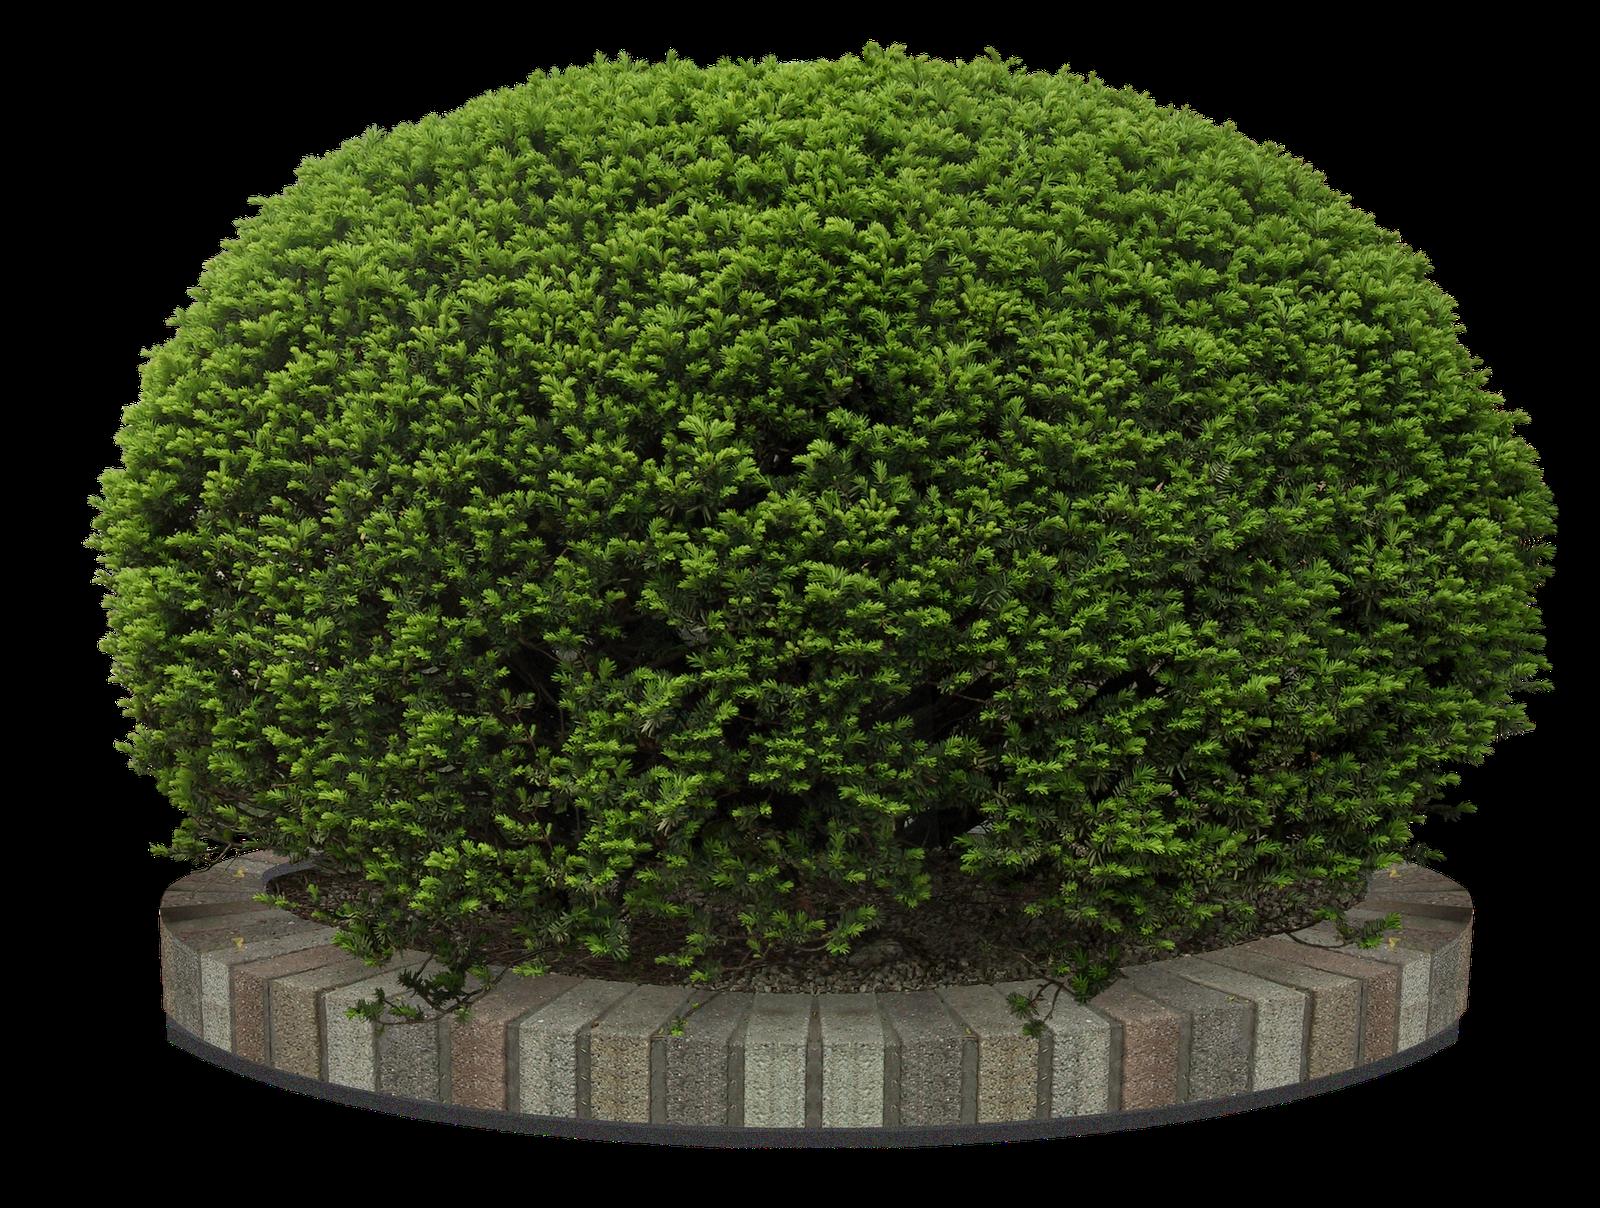 Pin de luna de abril en tubes png pinterest jardines - Arboles jardin ...